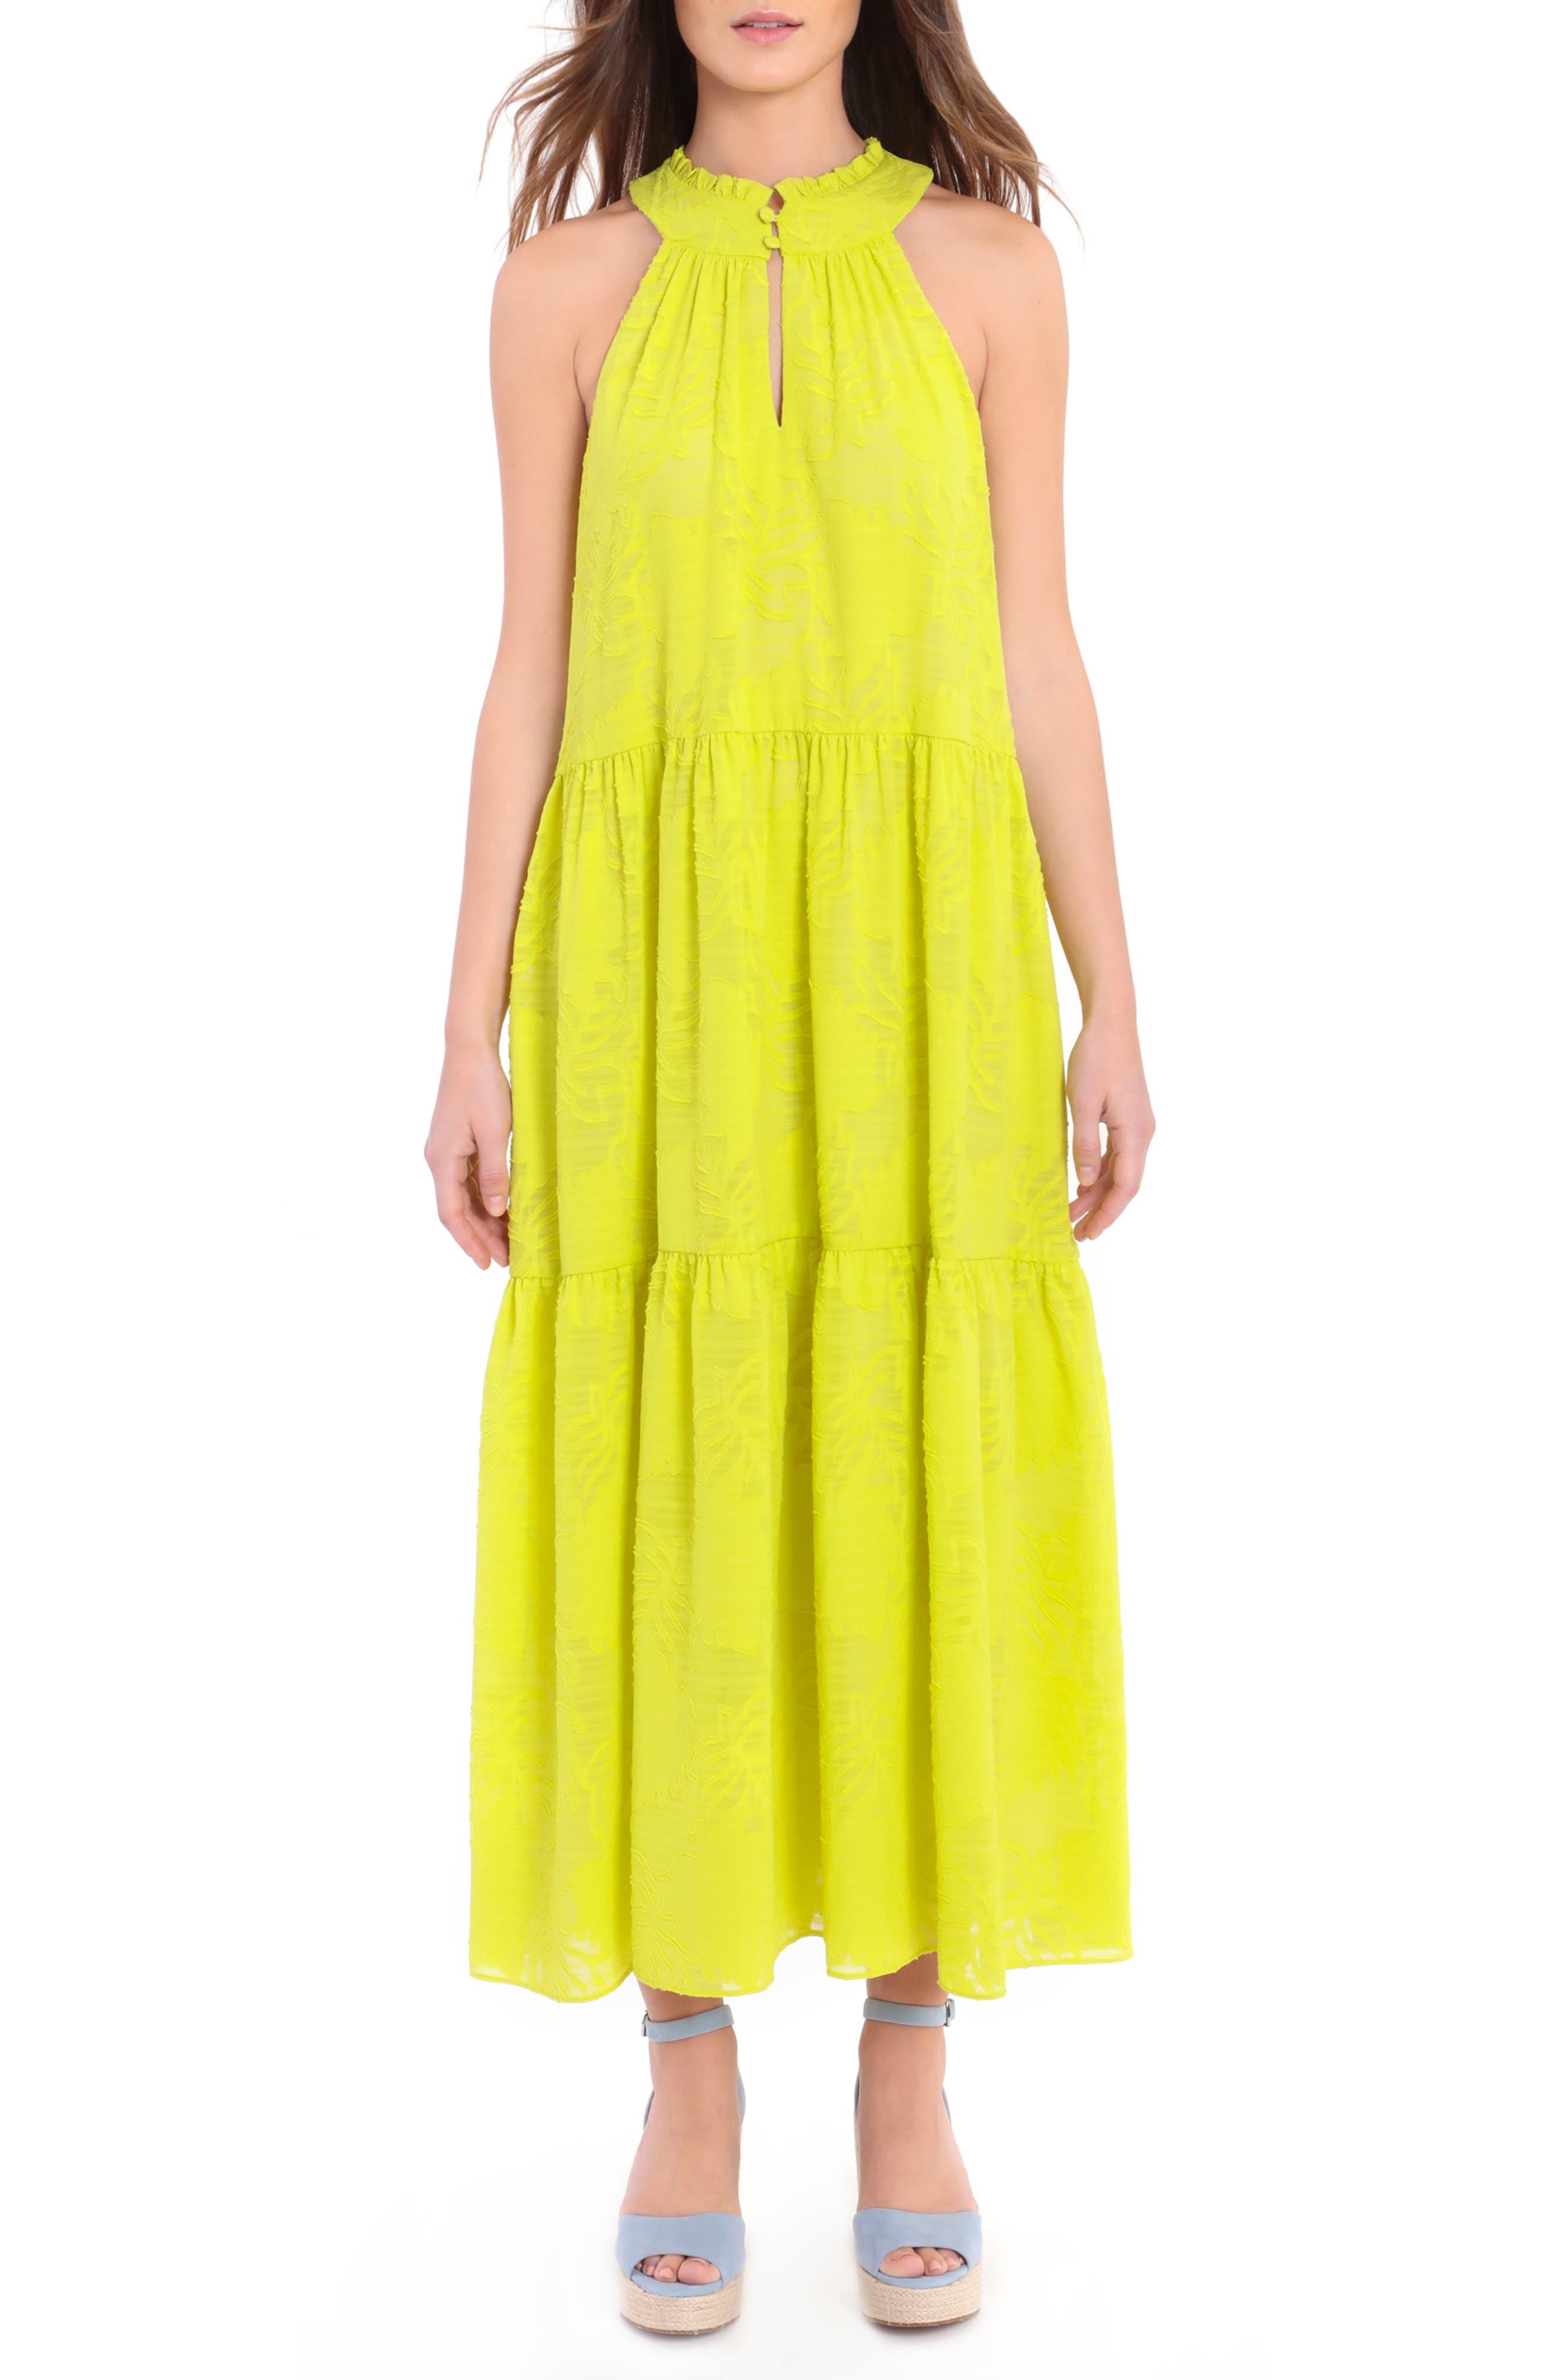 Halter Neck Burnout Chiffon Tiered Maxi Dress